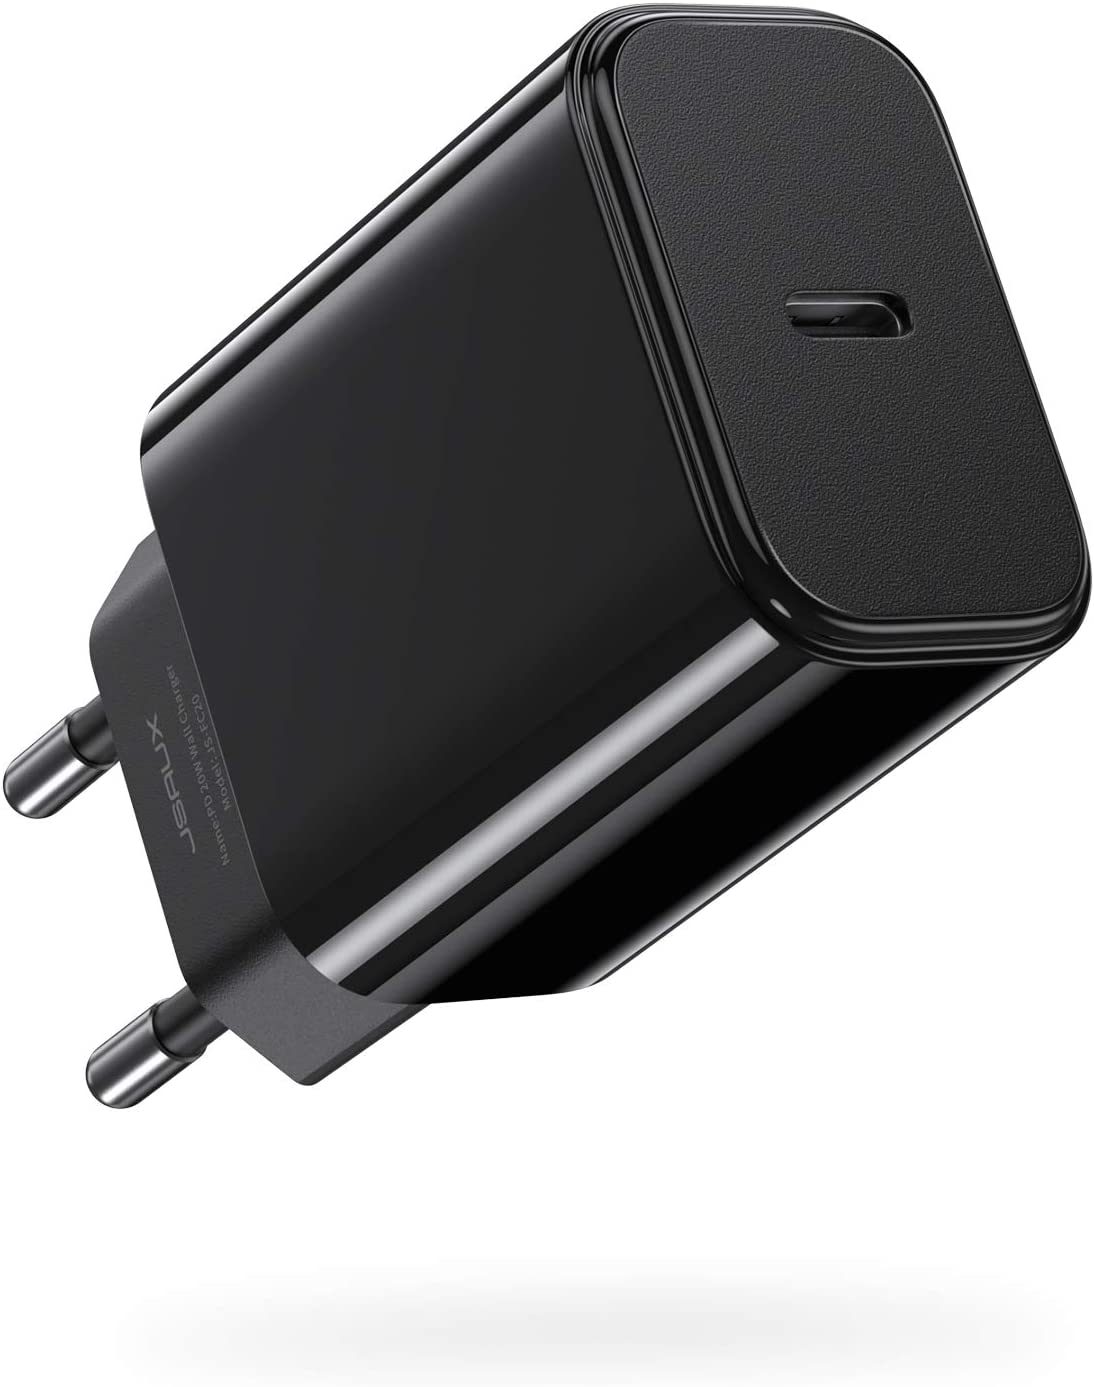 JSAUX Cargador USB C 20W, Carga Rápida Power Delivery 3.0 Tipo C Cargador Adaptador Compatible con iPhone 12 Mini/12/12 Pro/12 Pro MAX,iPhone 11 Pro/Pro MAX/SE,Samsung,Google Pixel-Negro